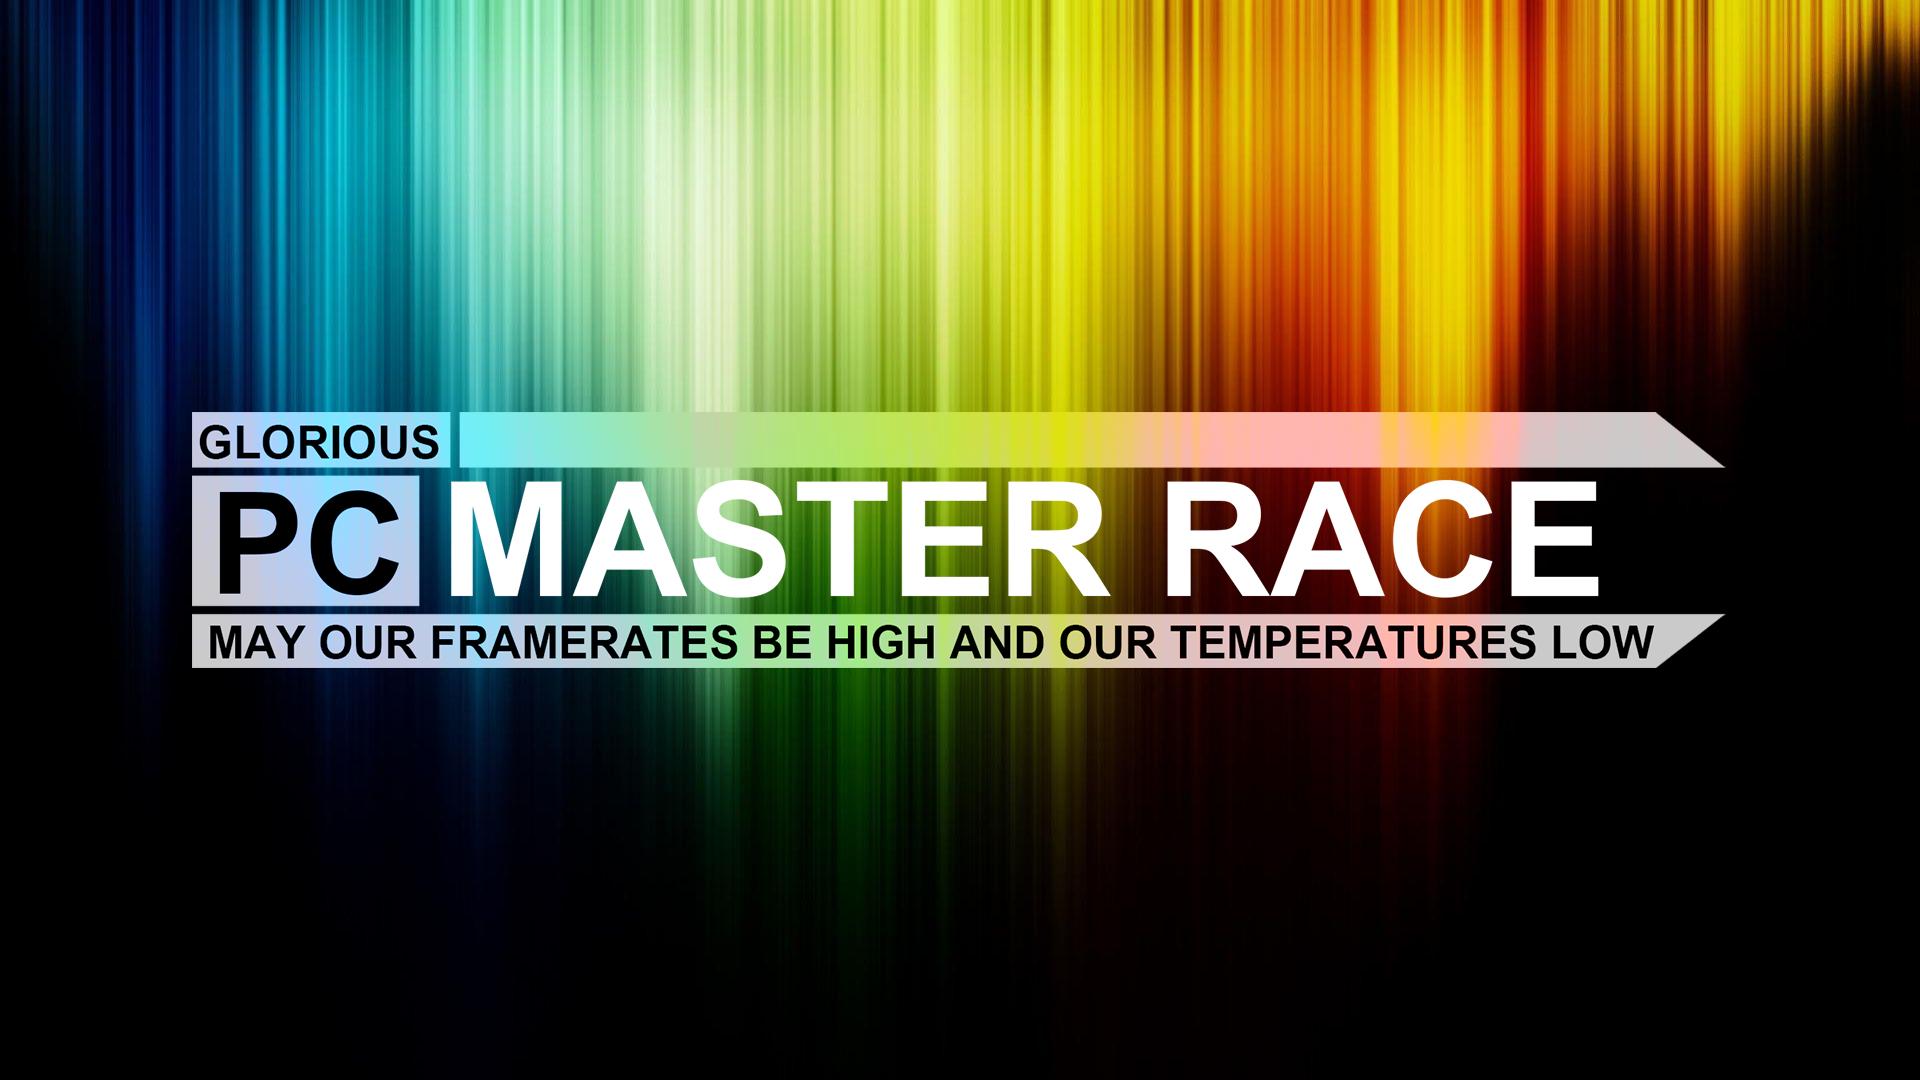 pc master race wallpaper - photo #2